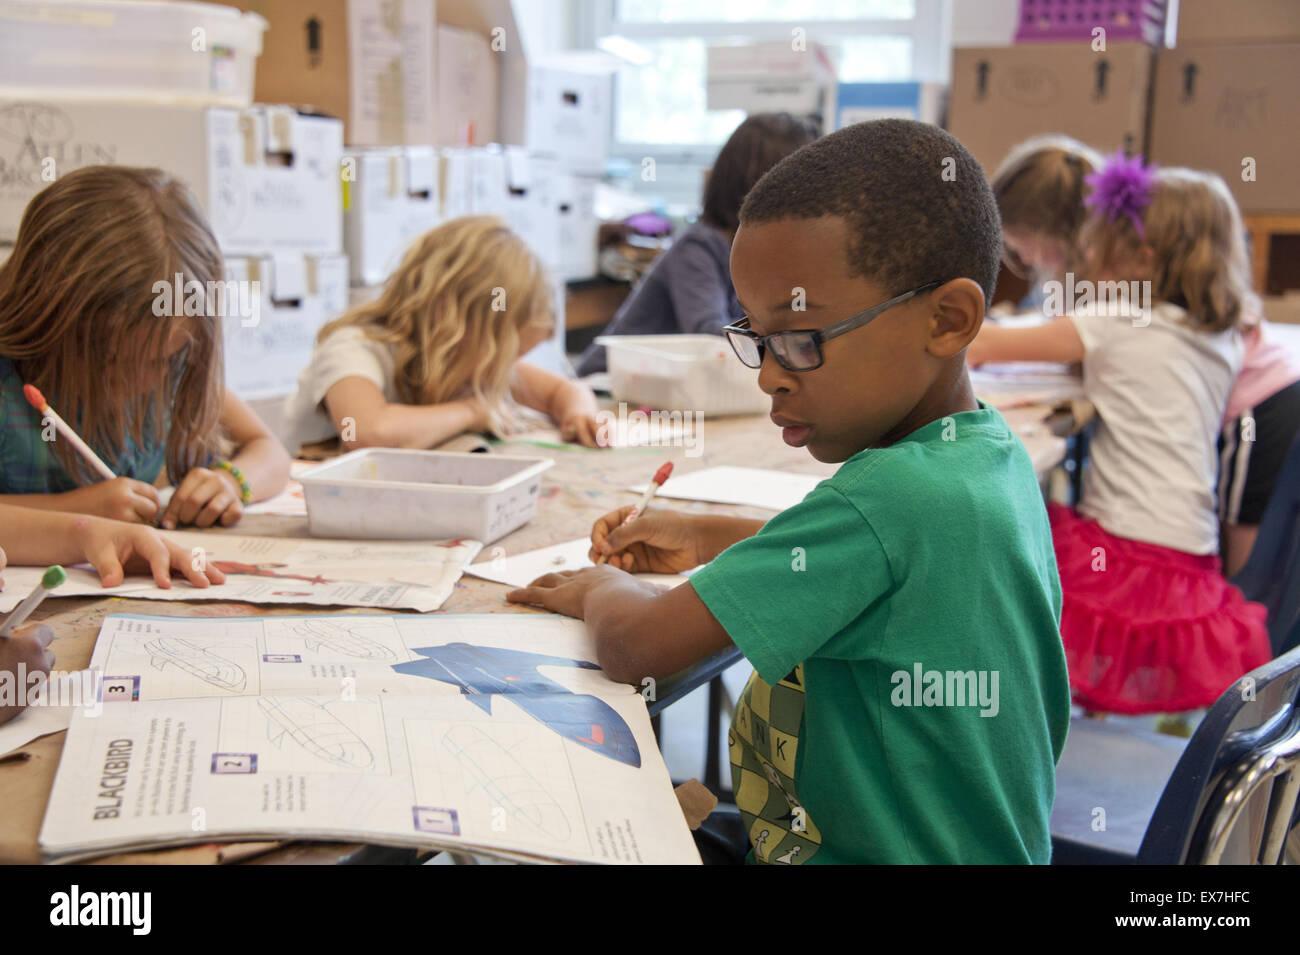 Afro-American minority student working in a school classroom in metropolitan, Atlanta, Georgia. - Stock Image